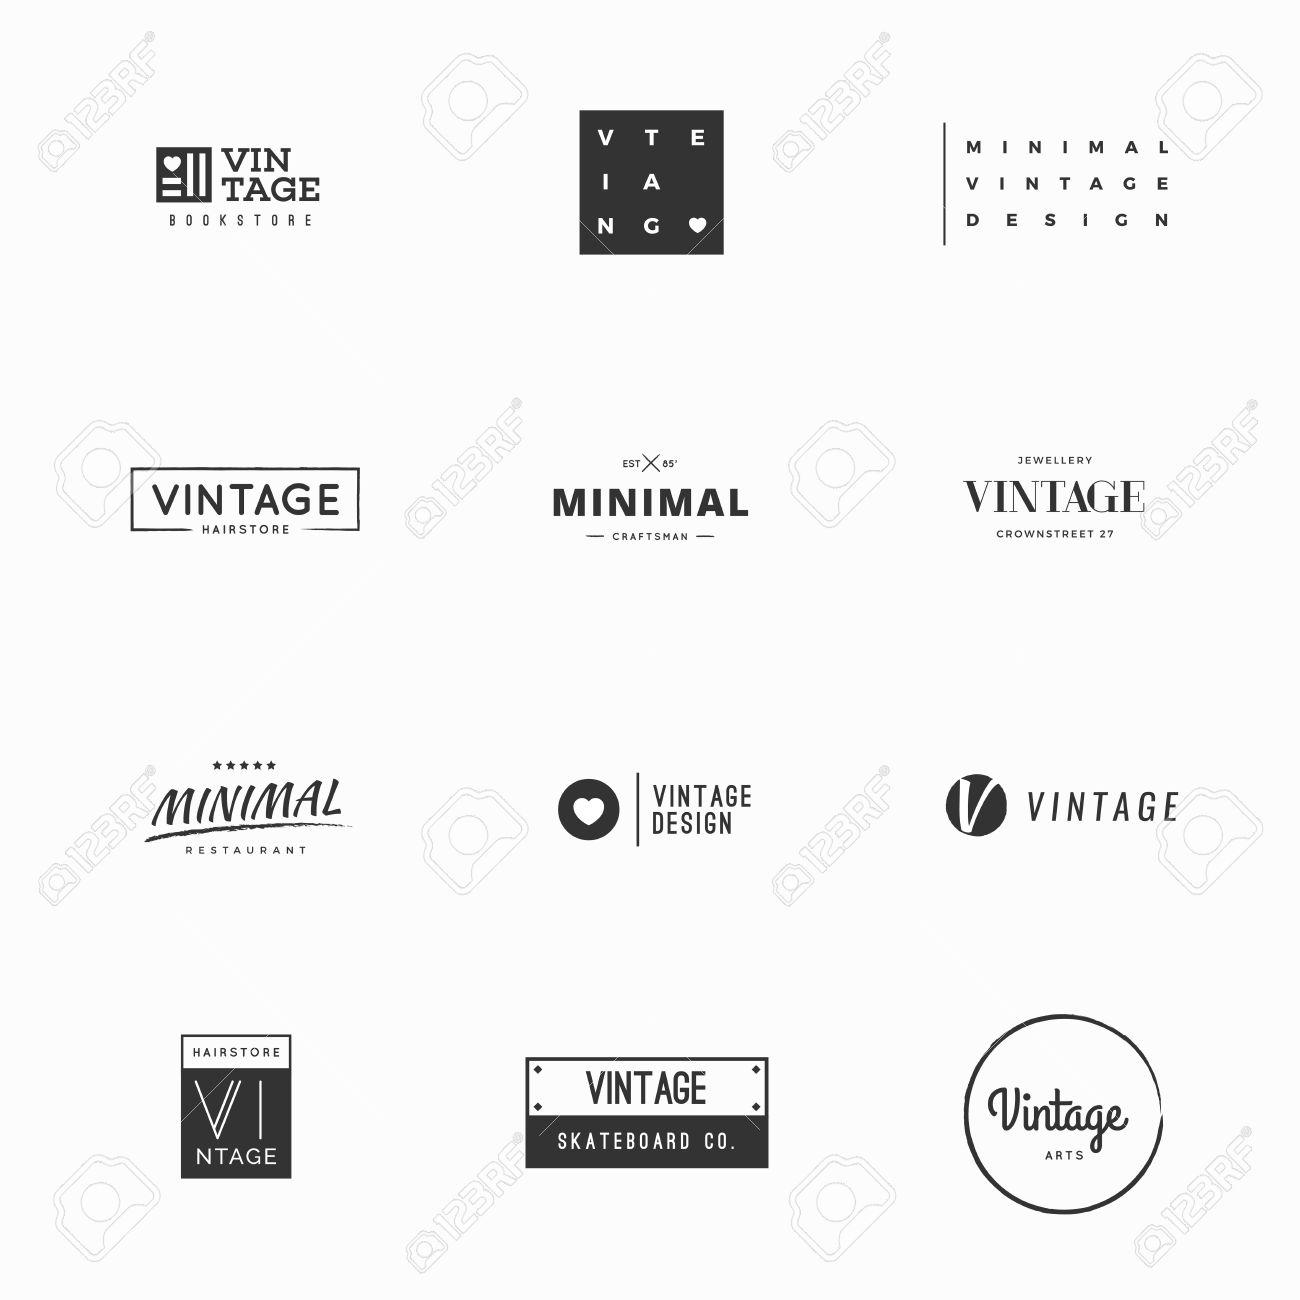 Minimal Vintage Vector Logo Templates For Brand Design Royalty Free ...